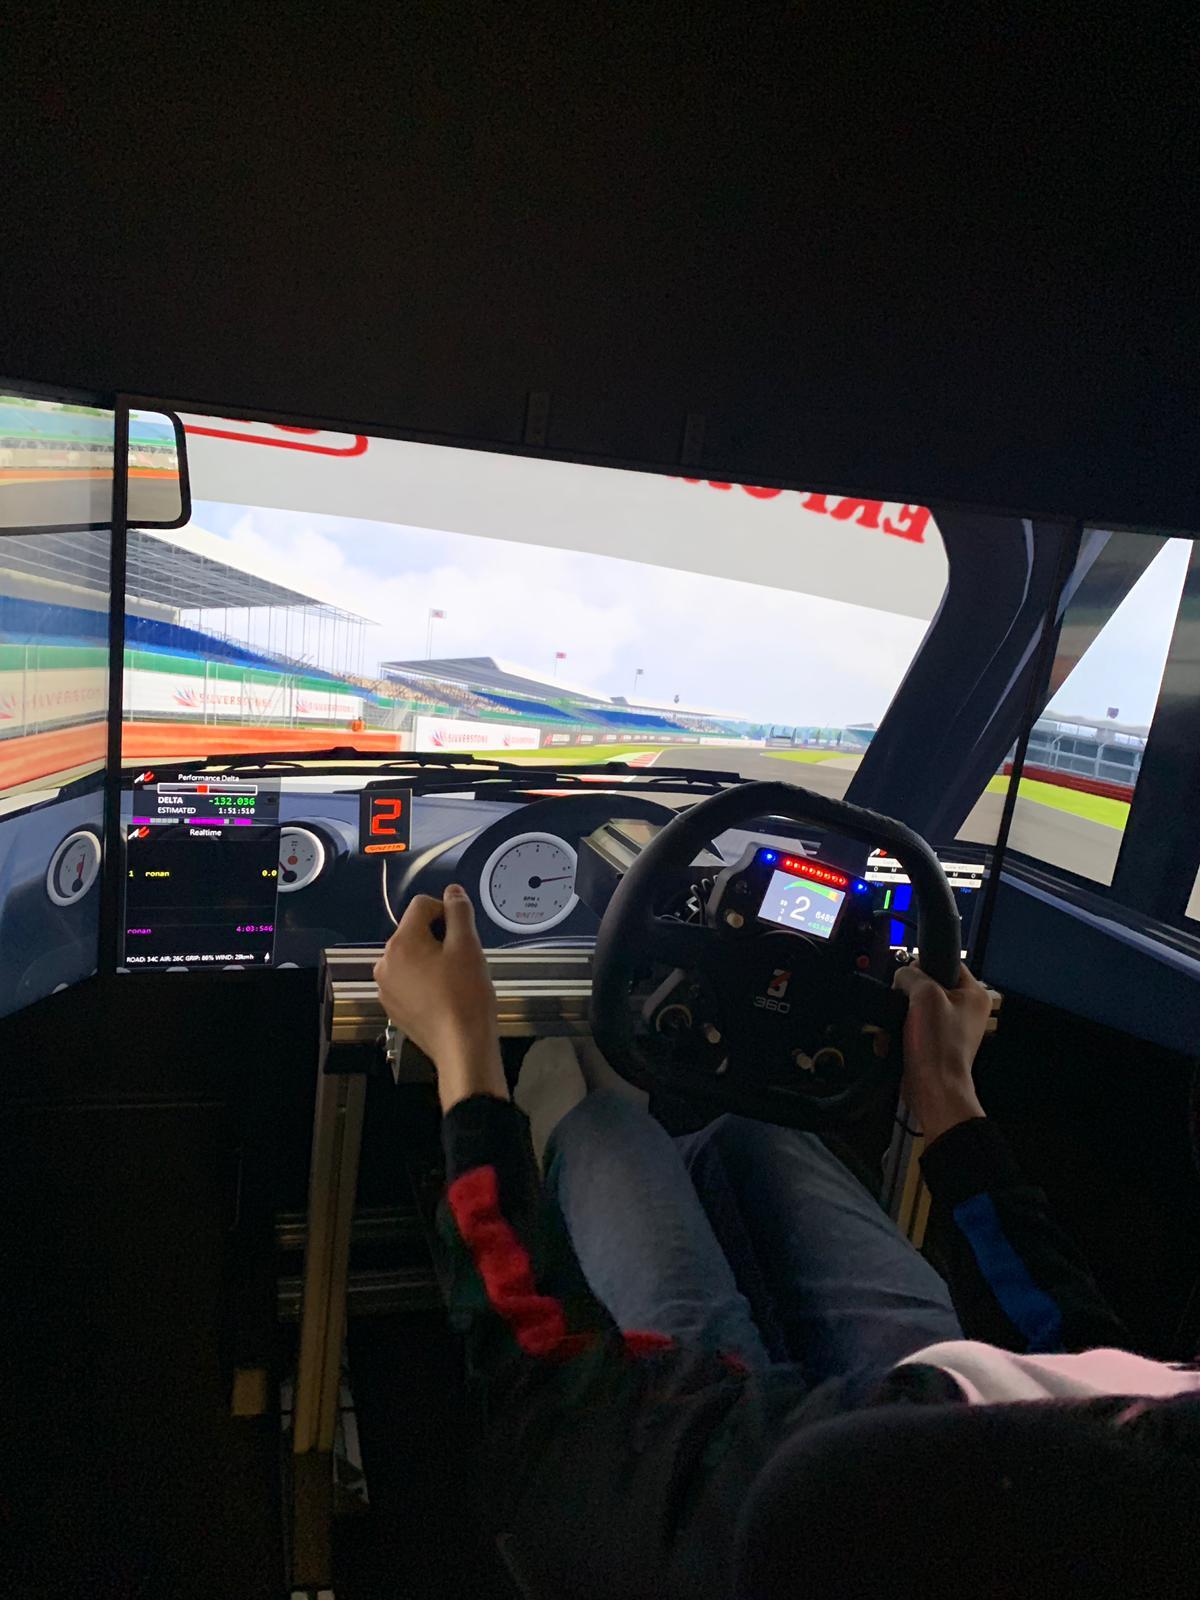 Gt car racing simulation training